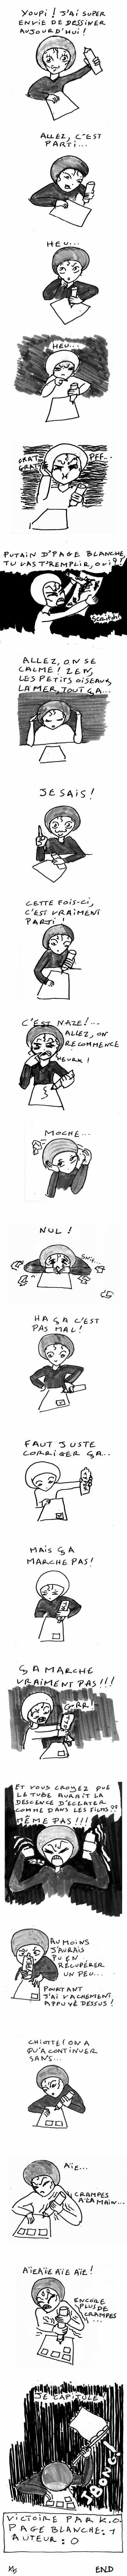 http://www.graph-illustra-web.fr/_BLOG/anliz-sv-page-blanche.jpg